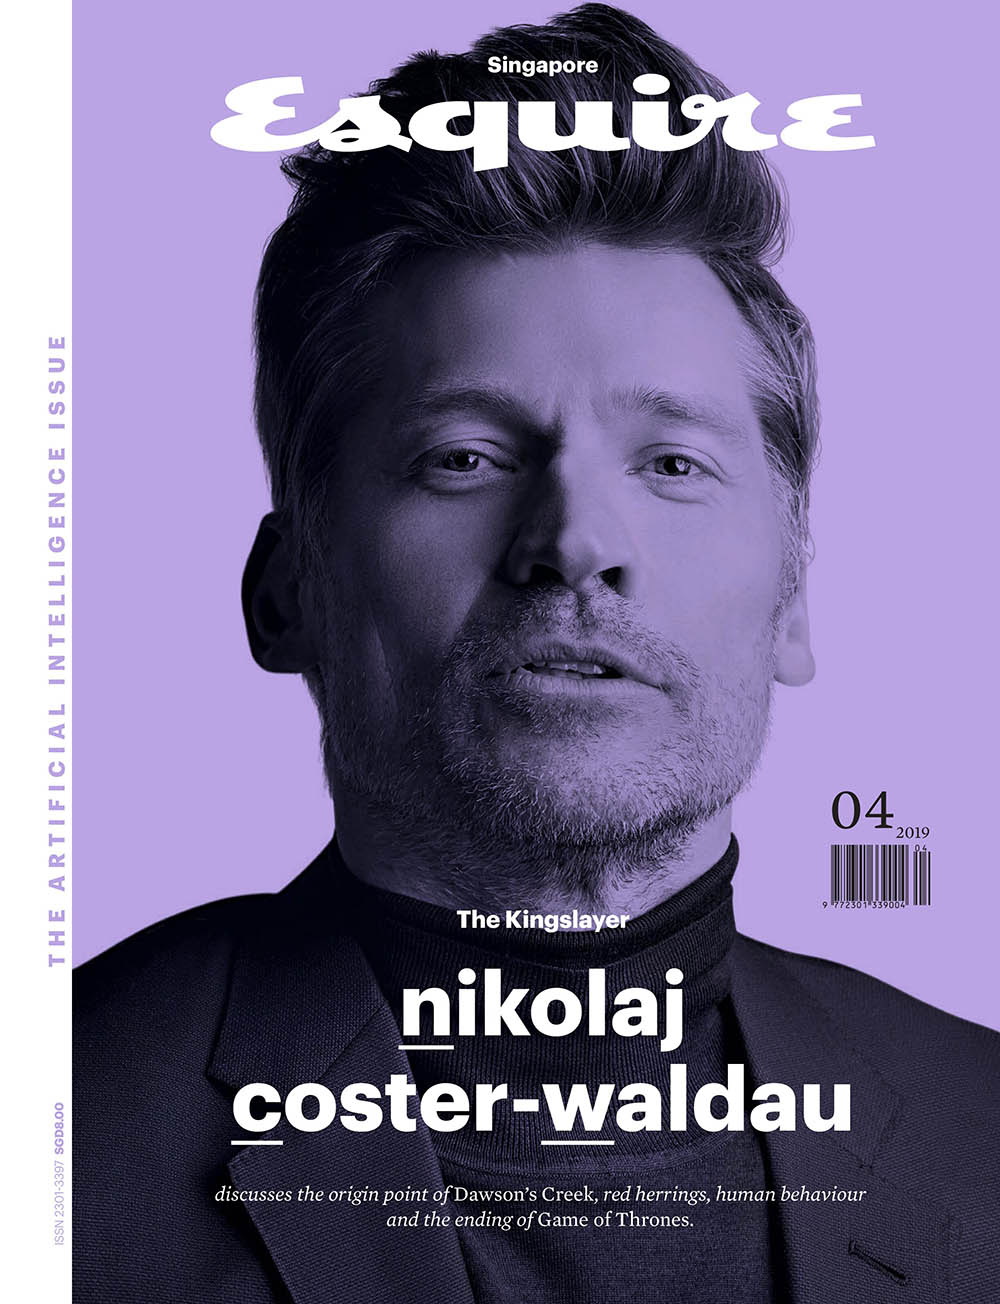 Nikolaj Coster-Waldau covers Esquire Singapore April 2019 by Lenne Chai